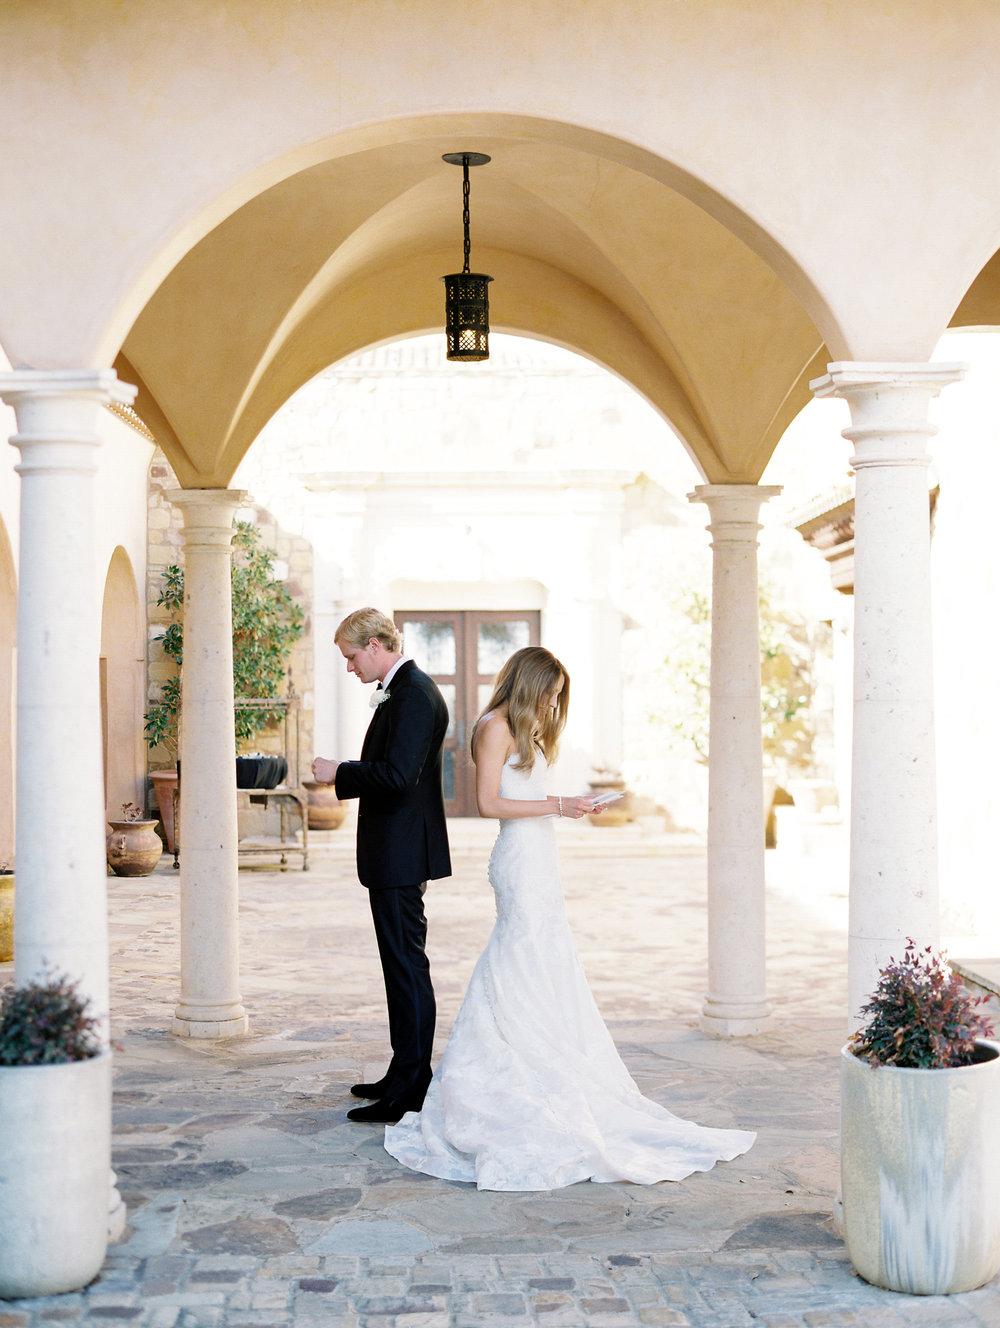 Escondido-Golf_Lake-Club-Hill-Country-Houston-Wedding-Photographer-Best-Top-Luxury-Destination-Engagements-Portrait-Austin-Photography-64.jpg